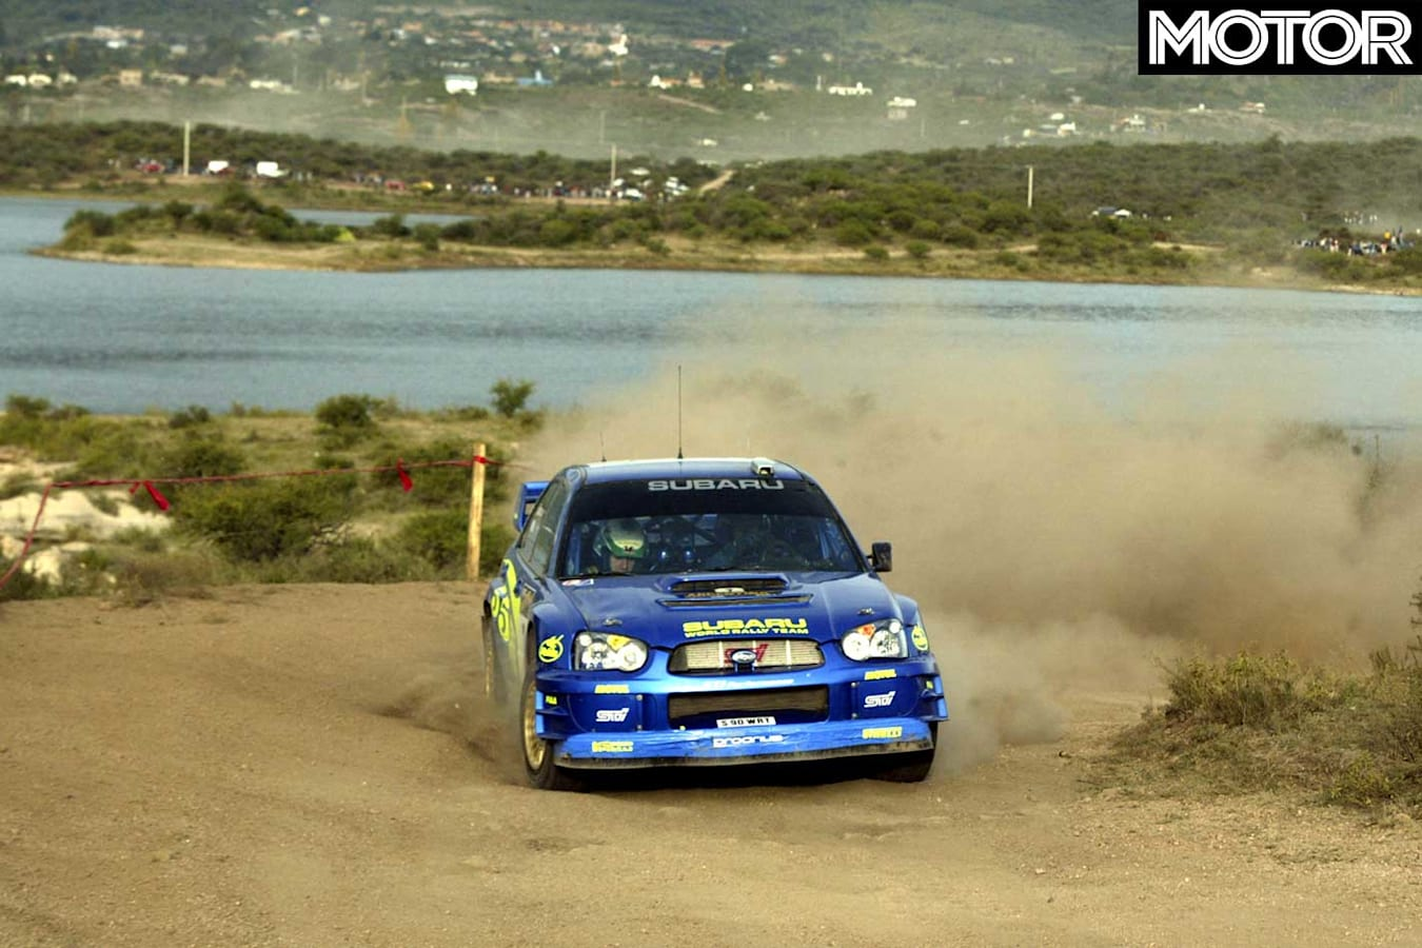 Subaru Impreza Rally Car Jpg